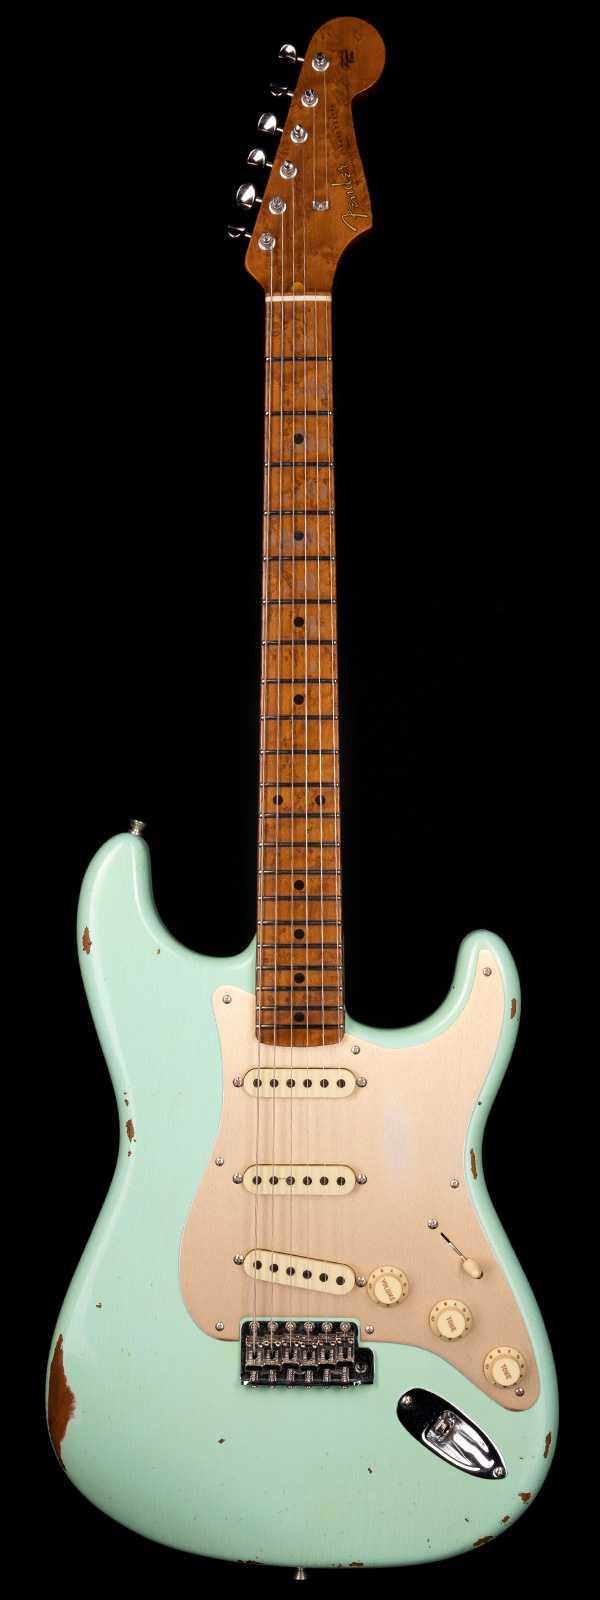 Fender Custom Shop 1956 Stratocaster Roasted 3A Birdseye Neck Relic Aged Surf Green